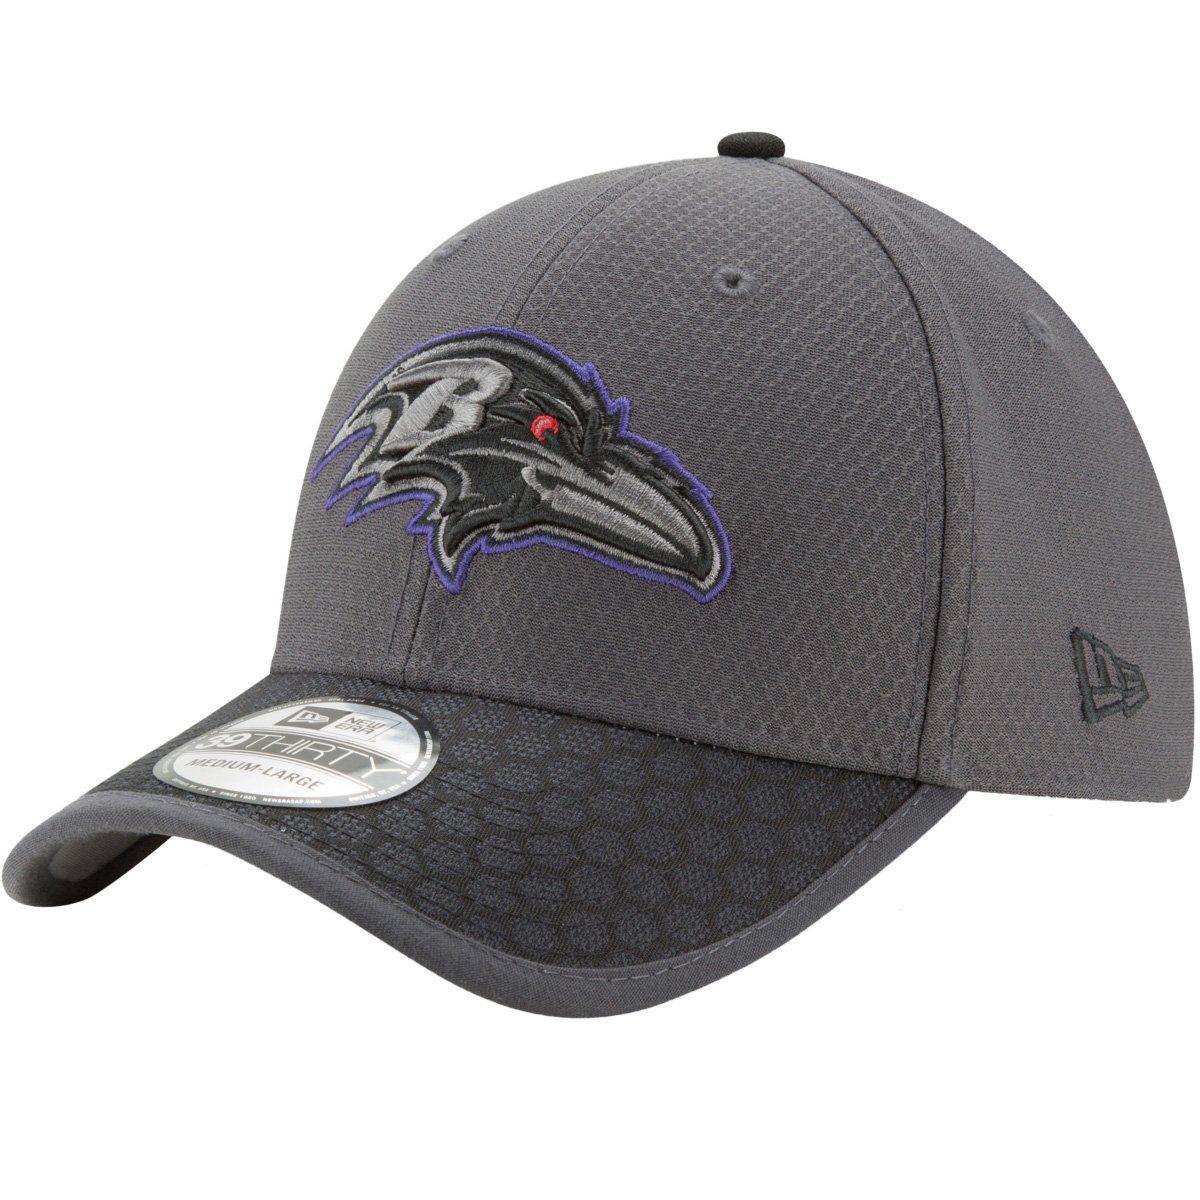 amfoo - New Era 39Thirty Cap - NFL 2017 SIDELINE Baltimore Ravens